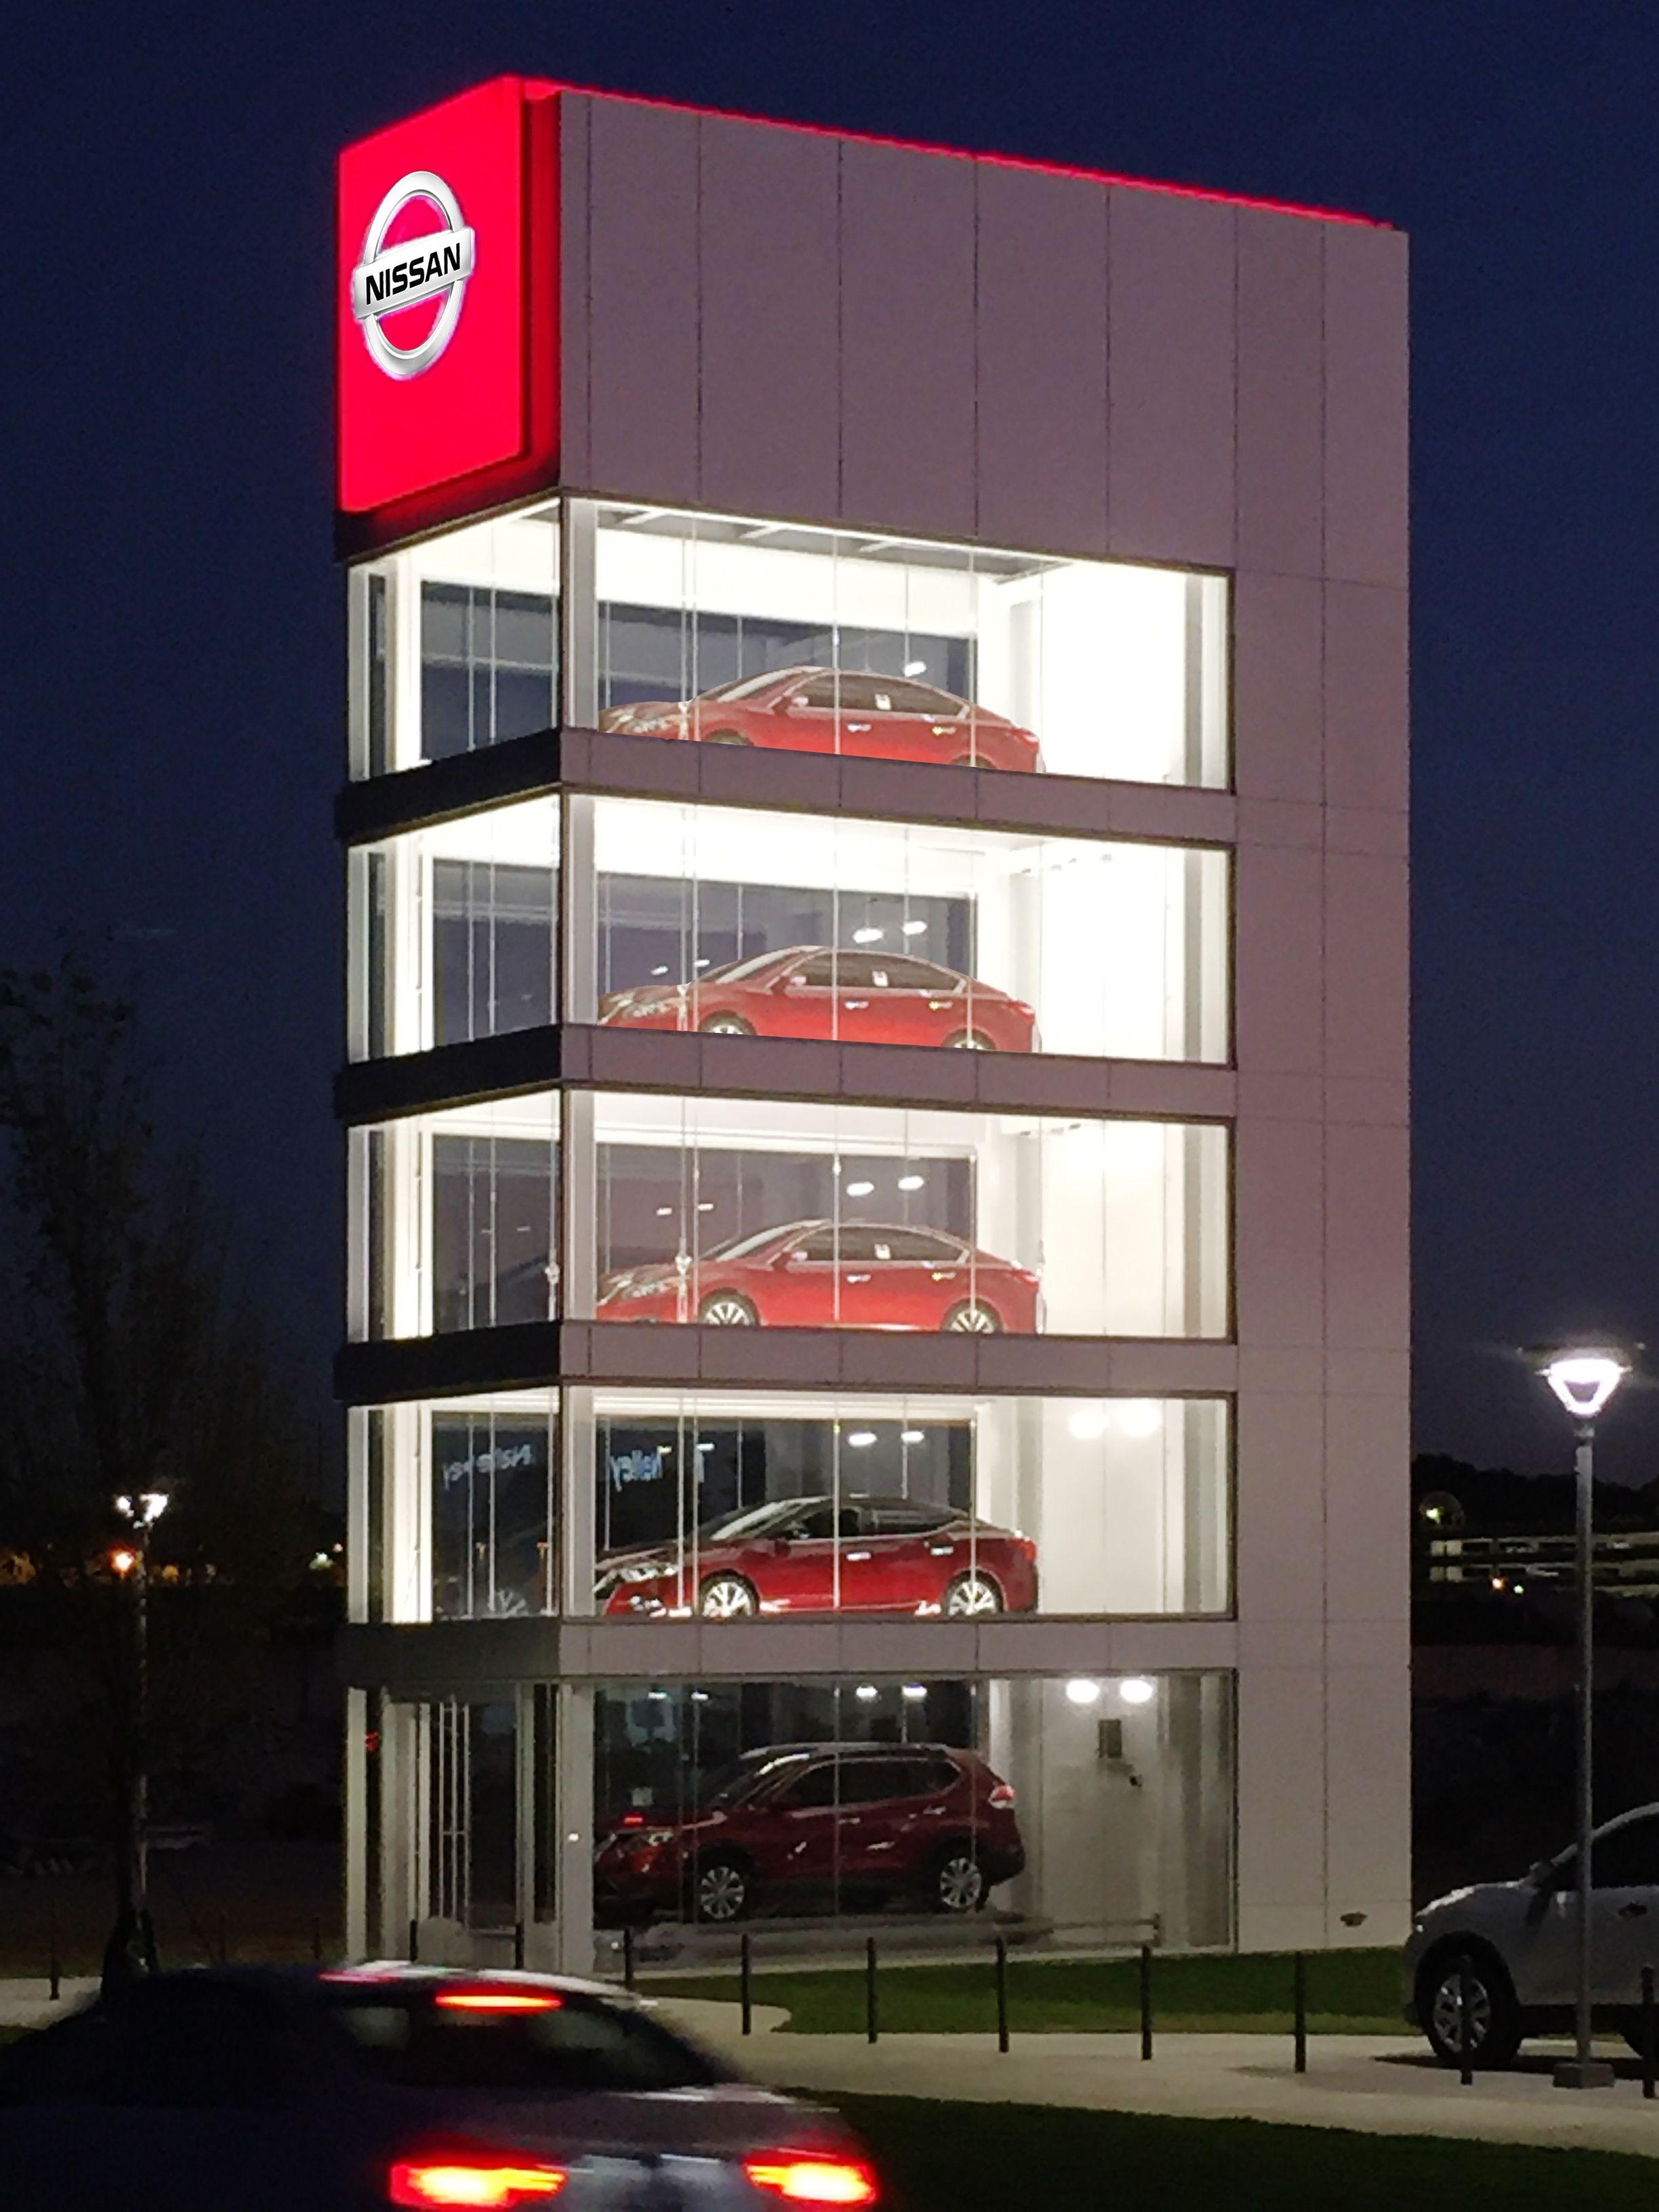 Nissan Display Atlanta GA Building, Display, Nissan